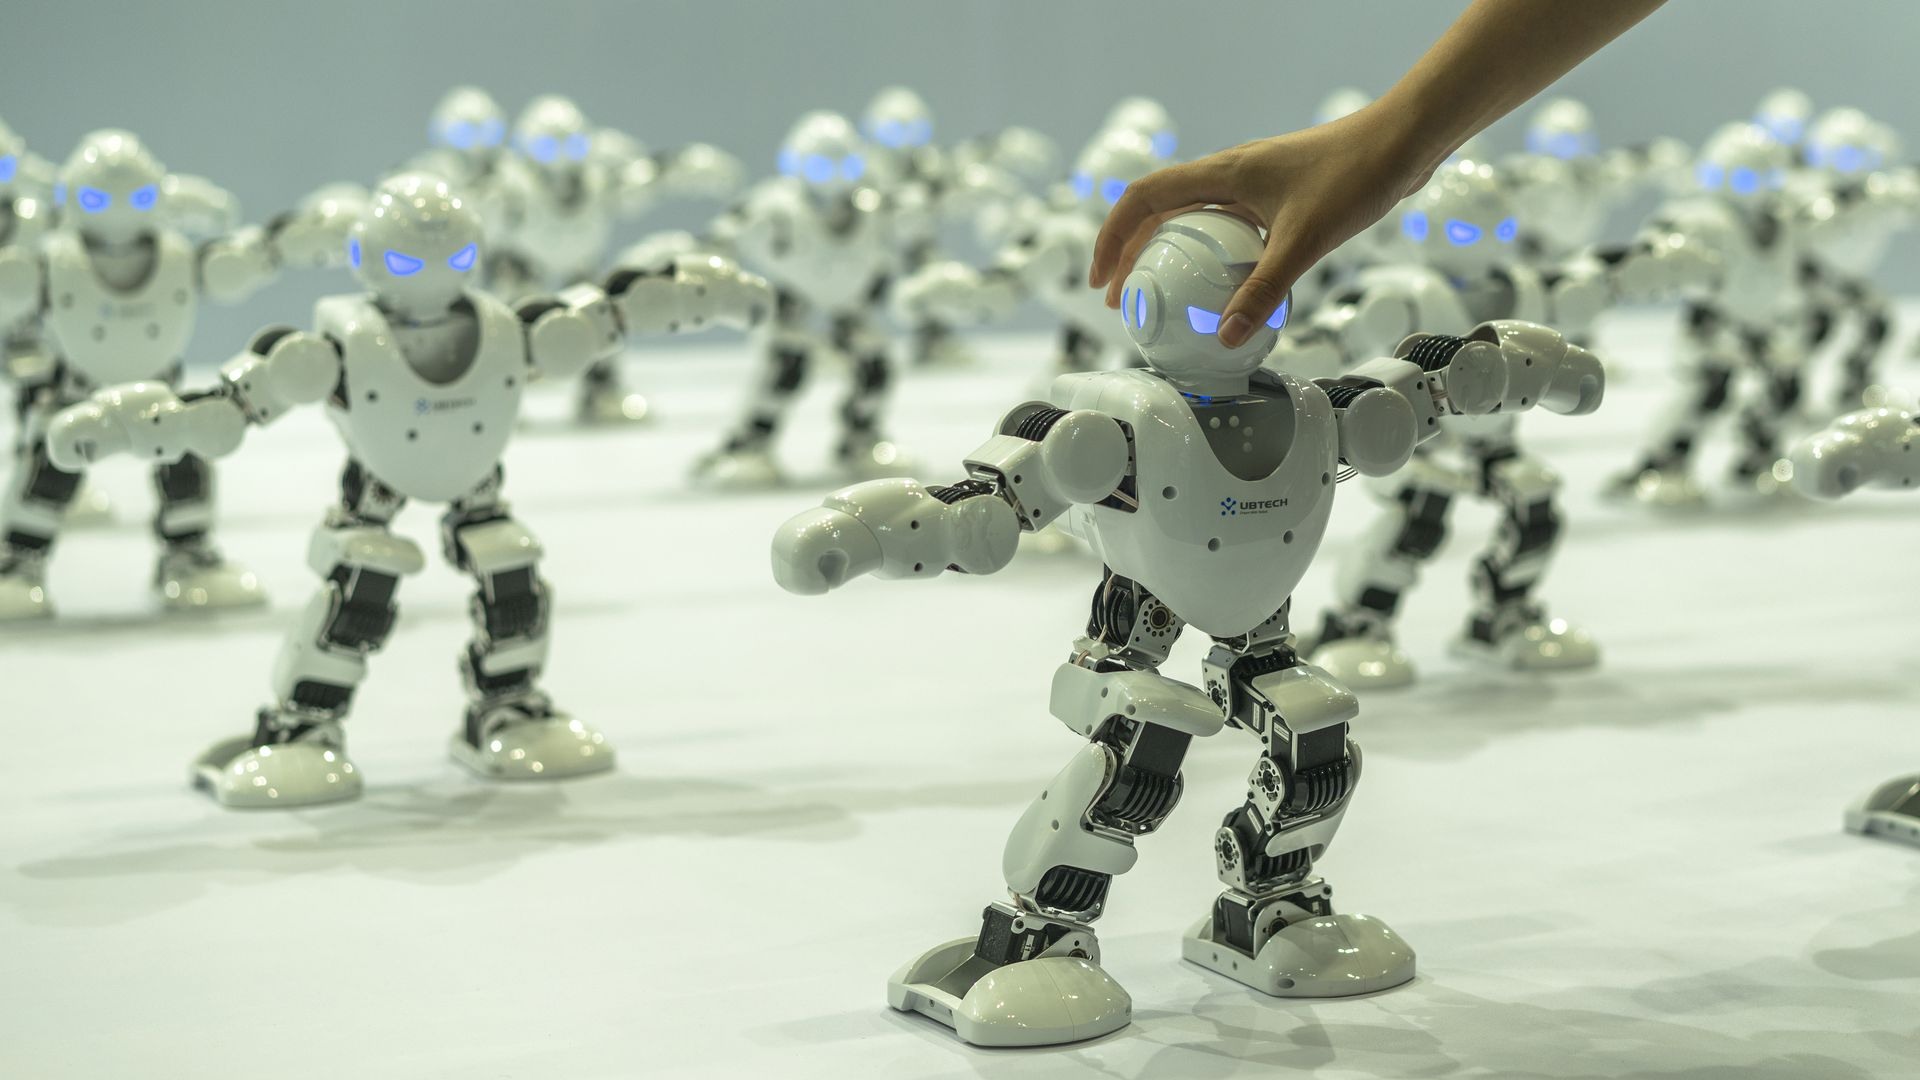 robots dance at consumer electronics trade show